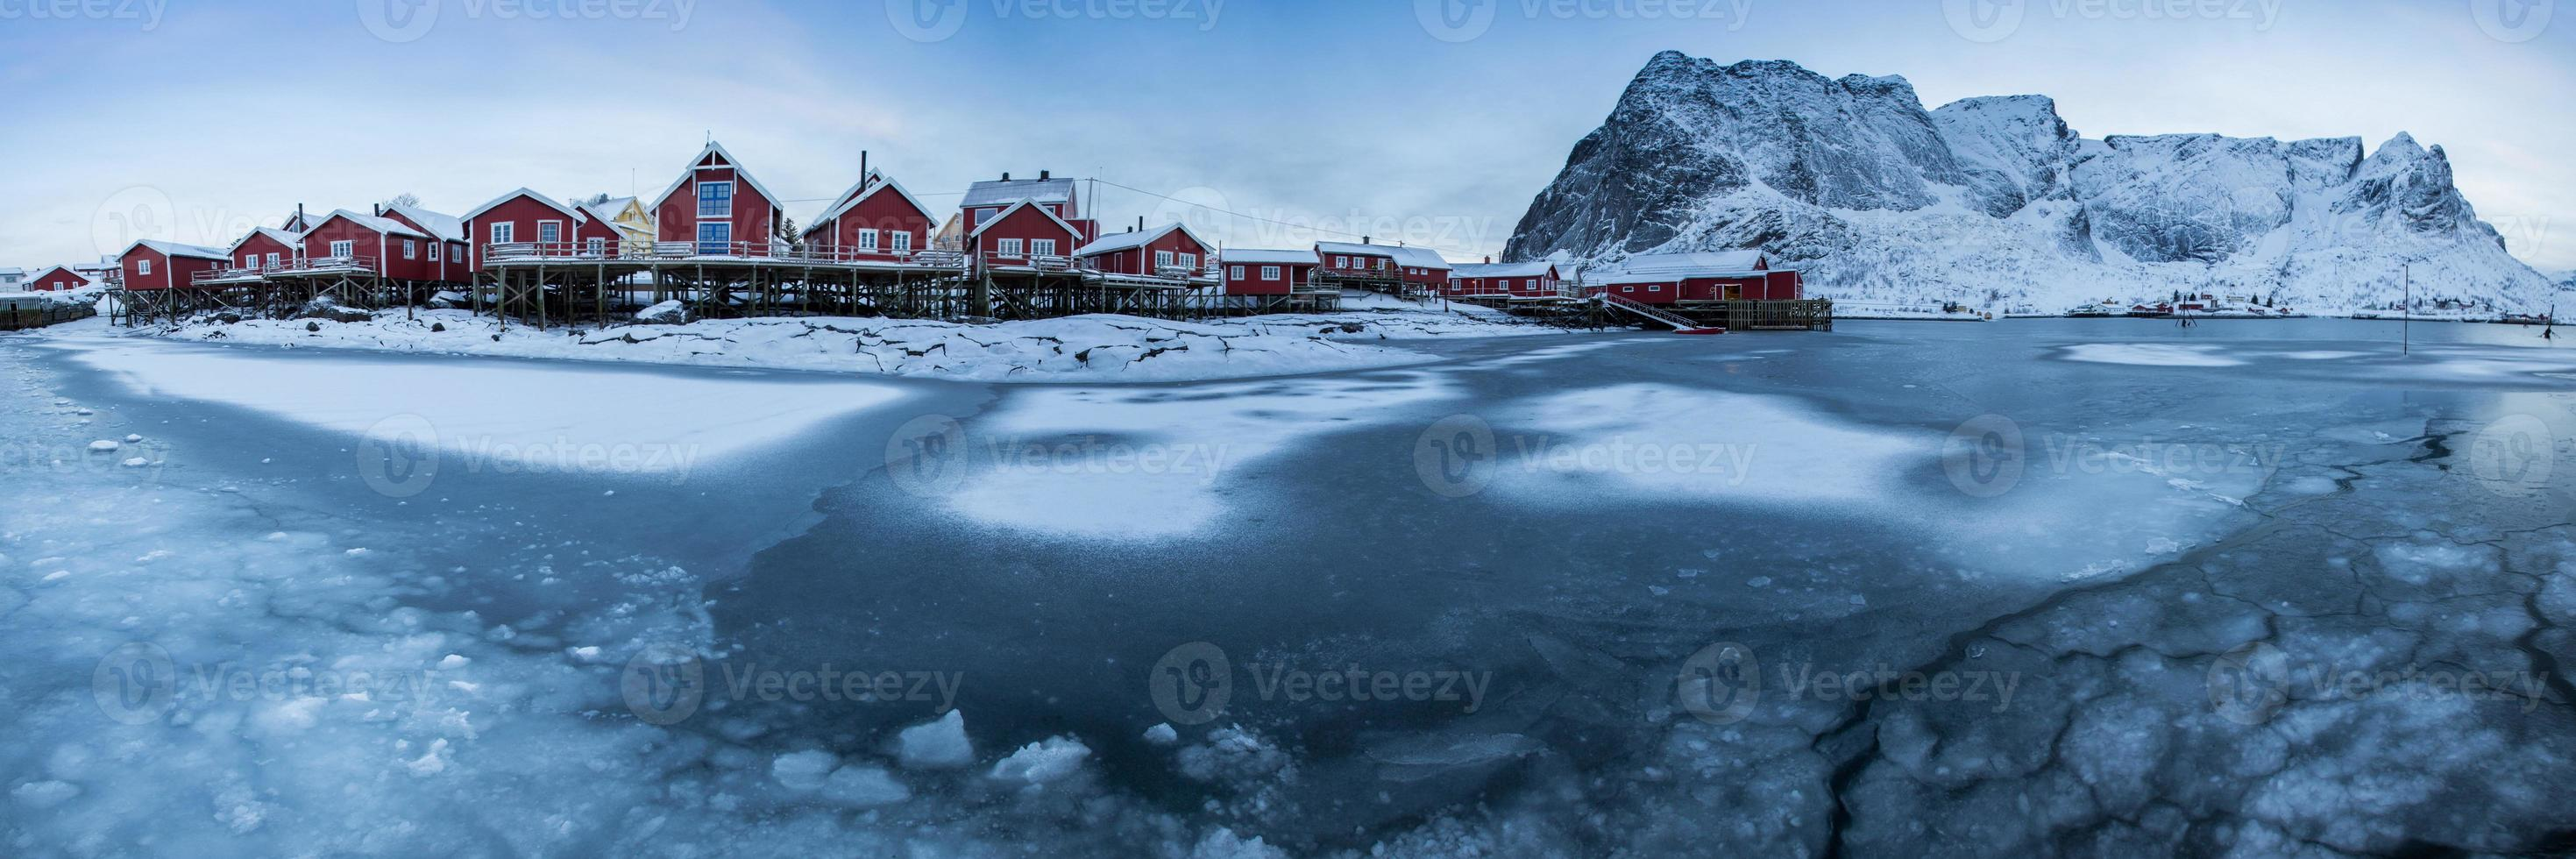 lofoten island diring inverno foto